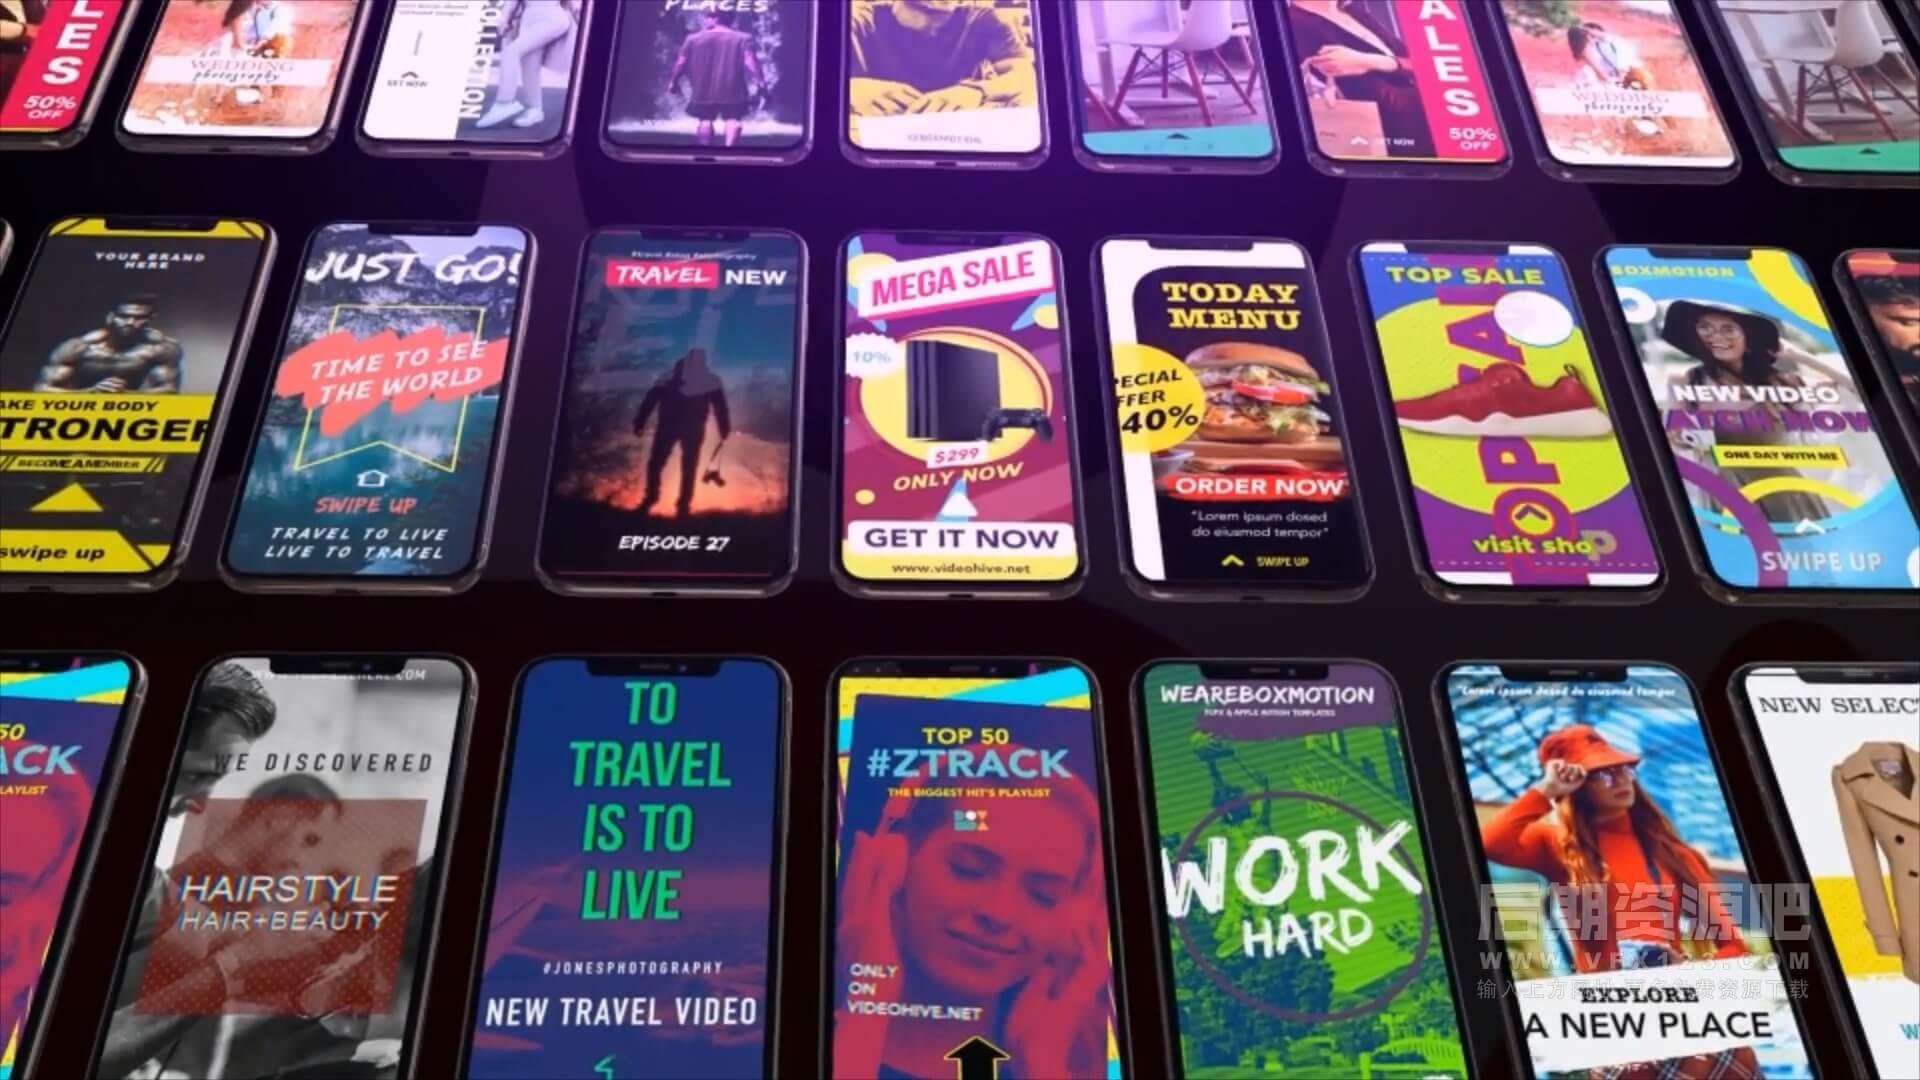 Fcpx竖屏模板 120+适用手机竖屏短视频制作素材 Instagram Creator Tool Kit